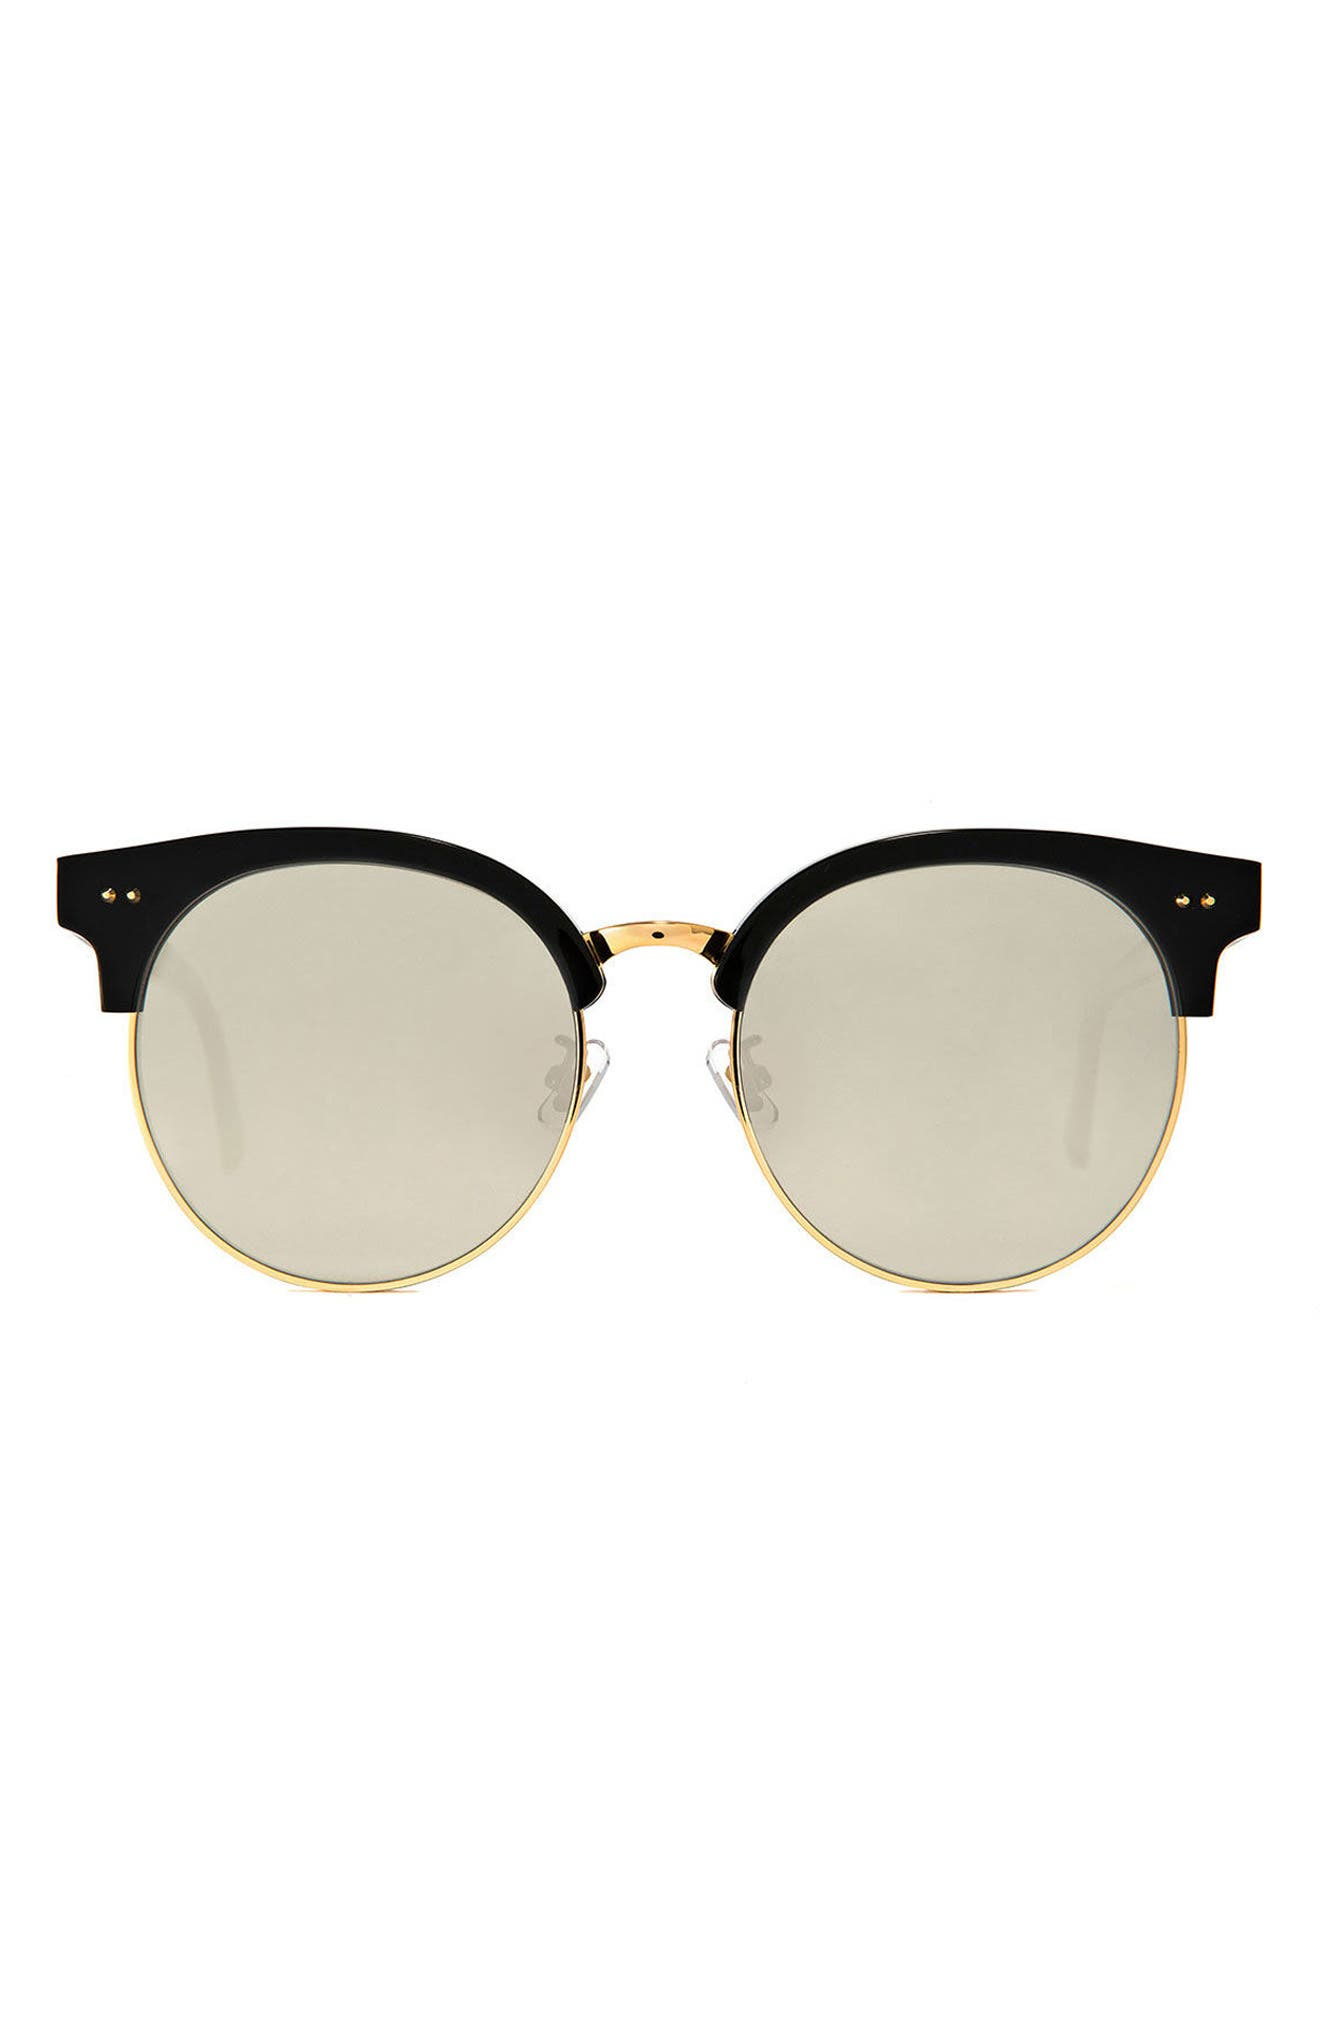 Alternate Image 1 Selected - Gentle Monster Moon Cut 55mm Sunglasses